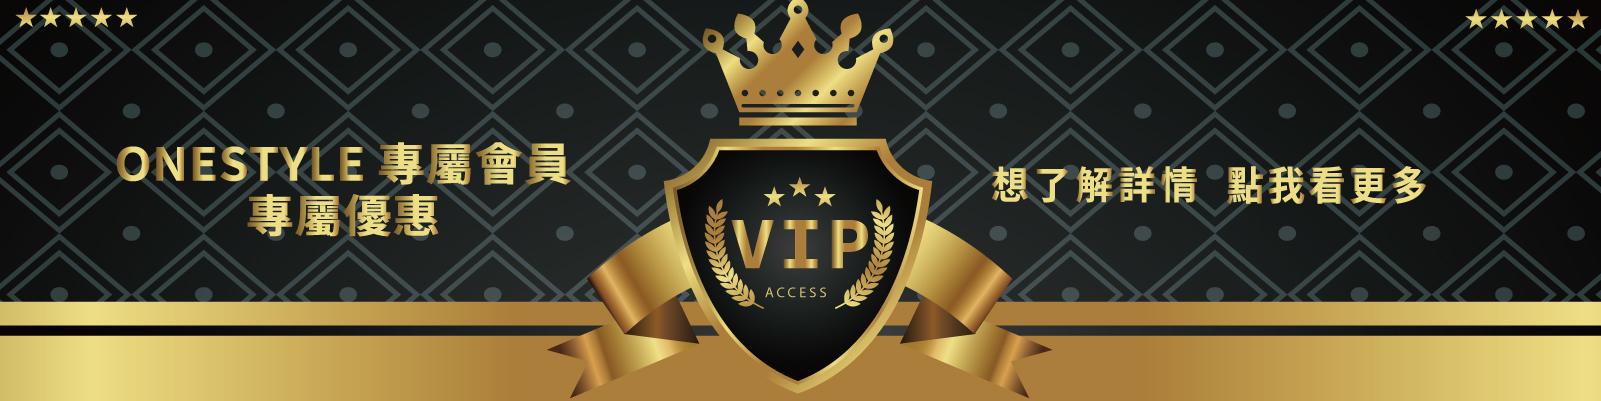 onestyle,健身用品店,會員,VIP,招募,優惠,折扣